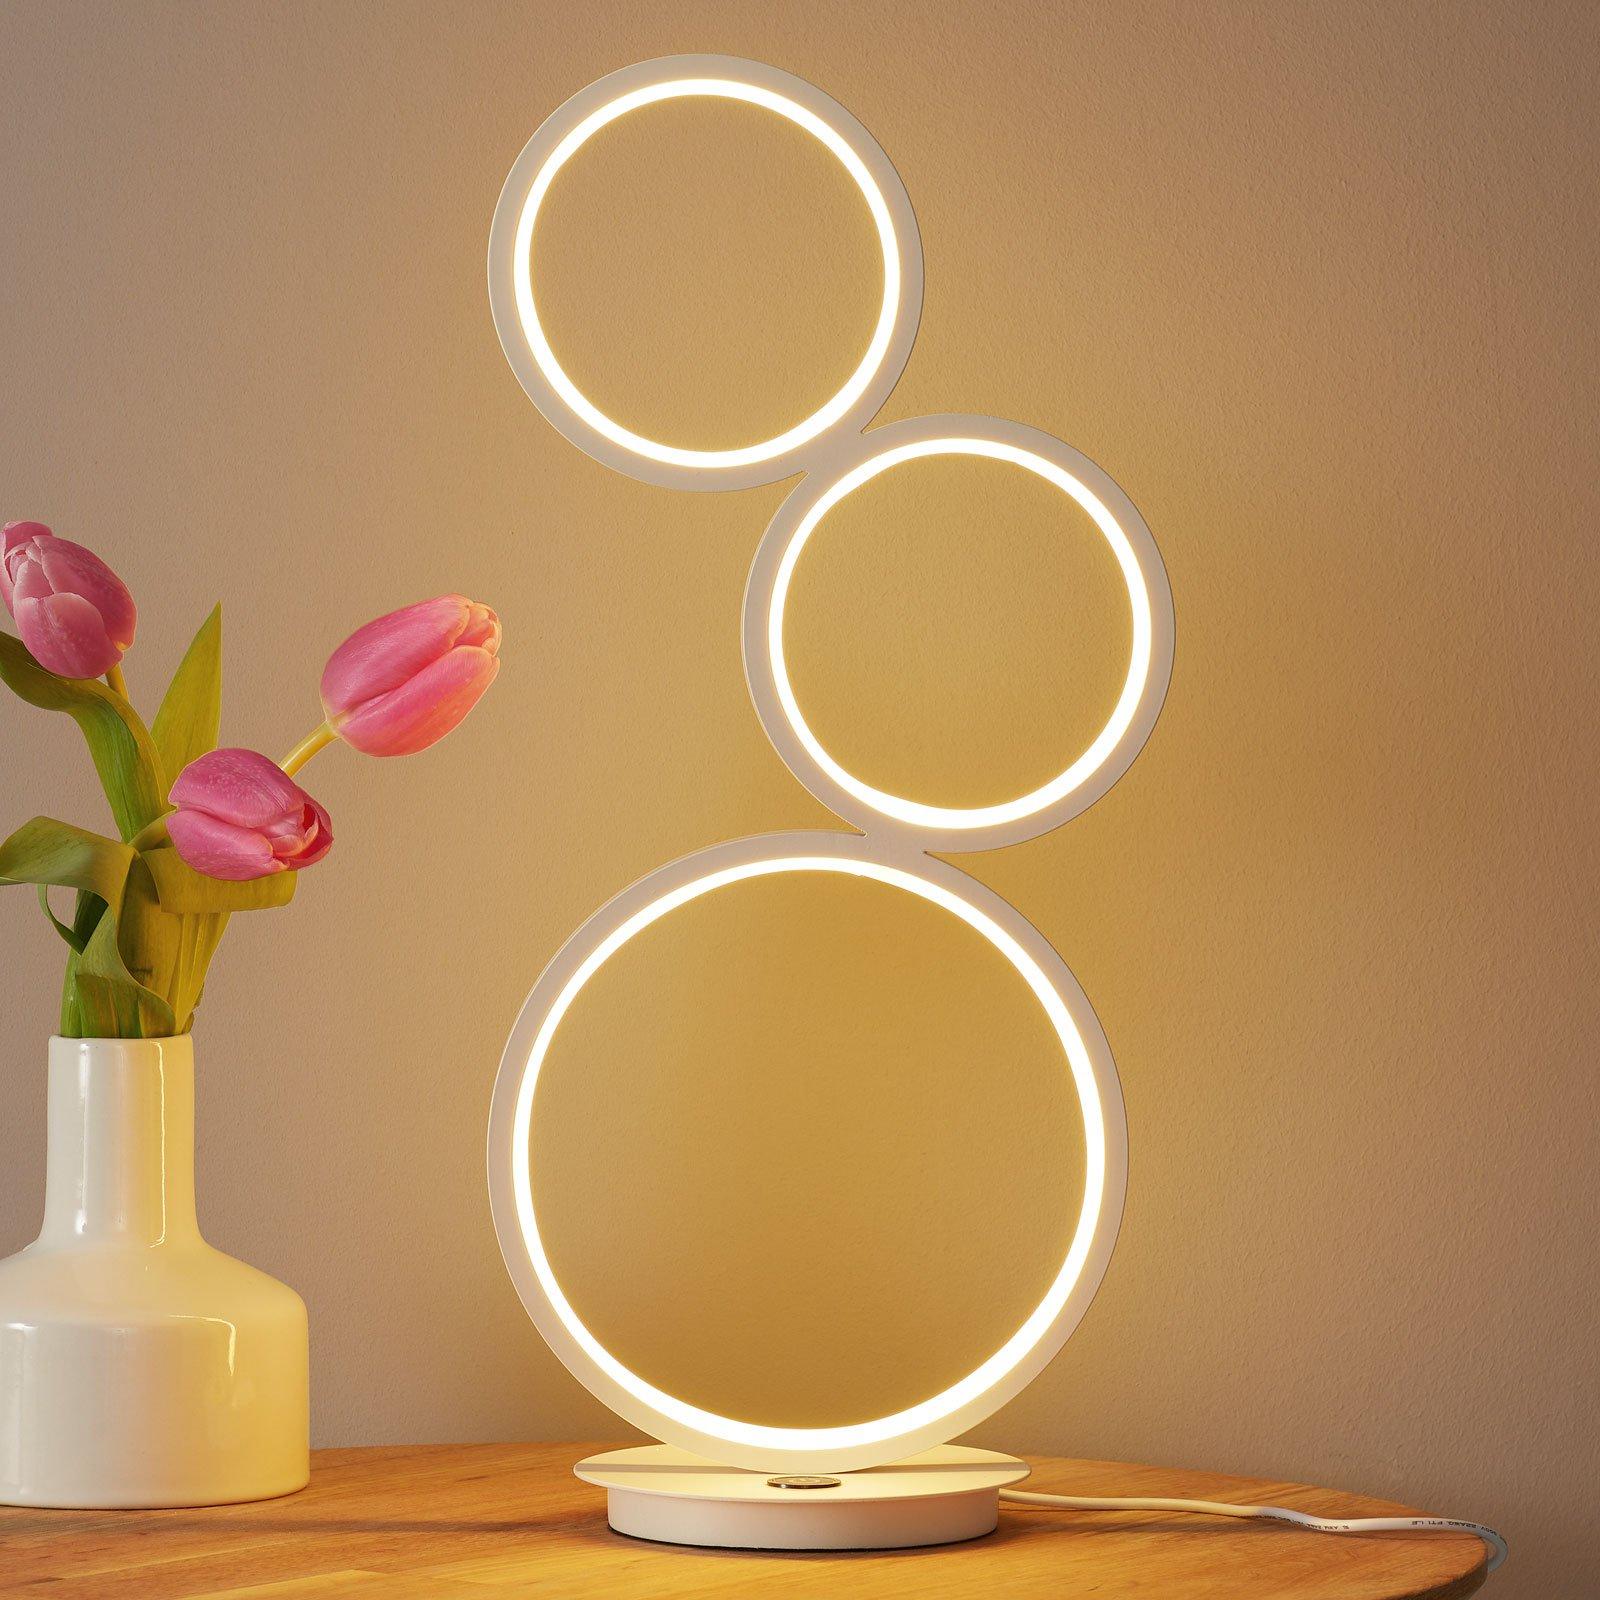 LED-bordlampe Vika med 3-trinns berøringsdimmer